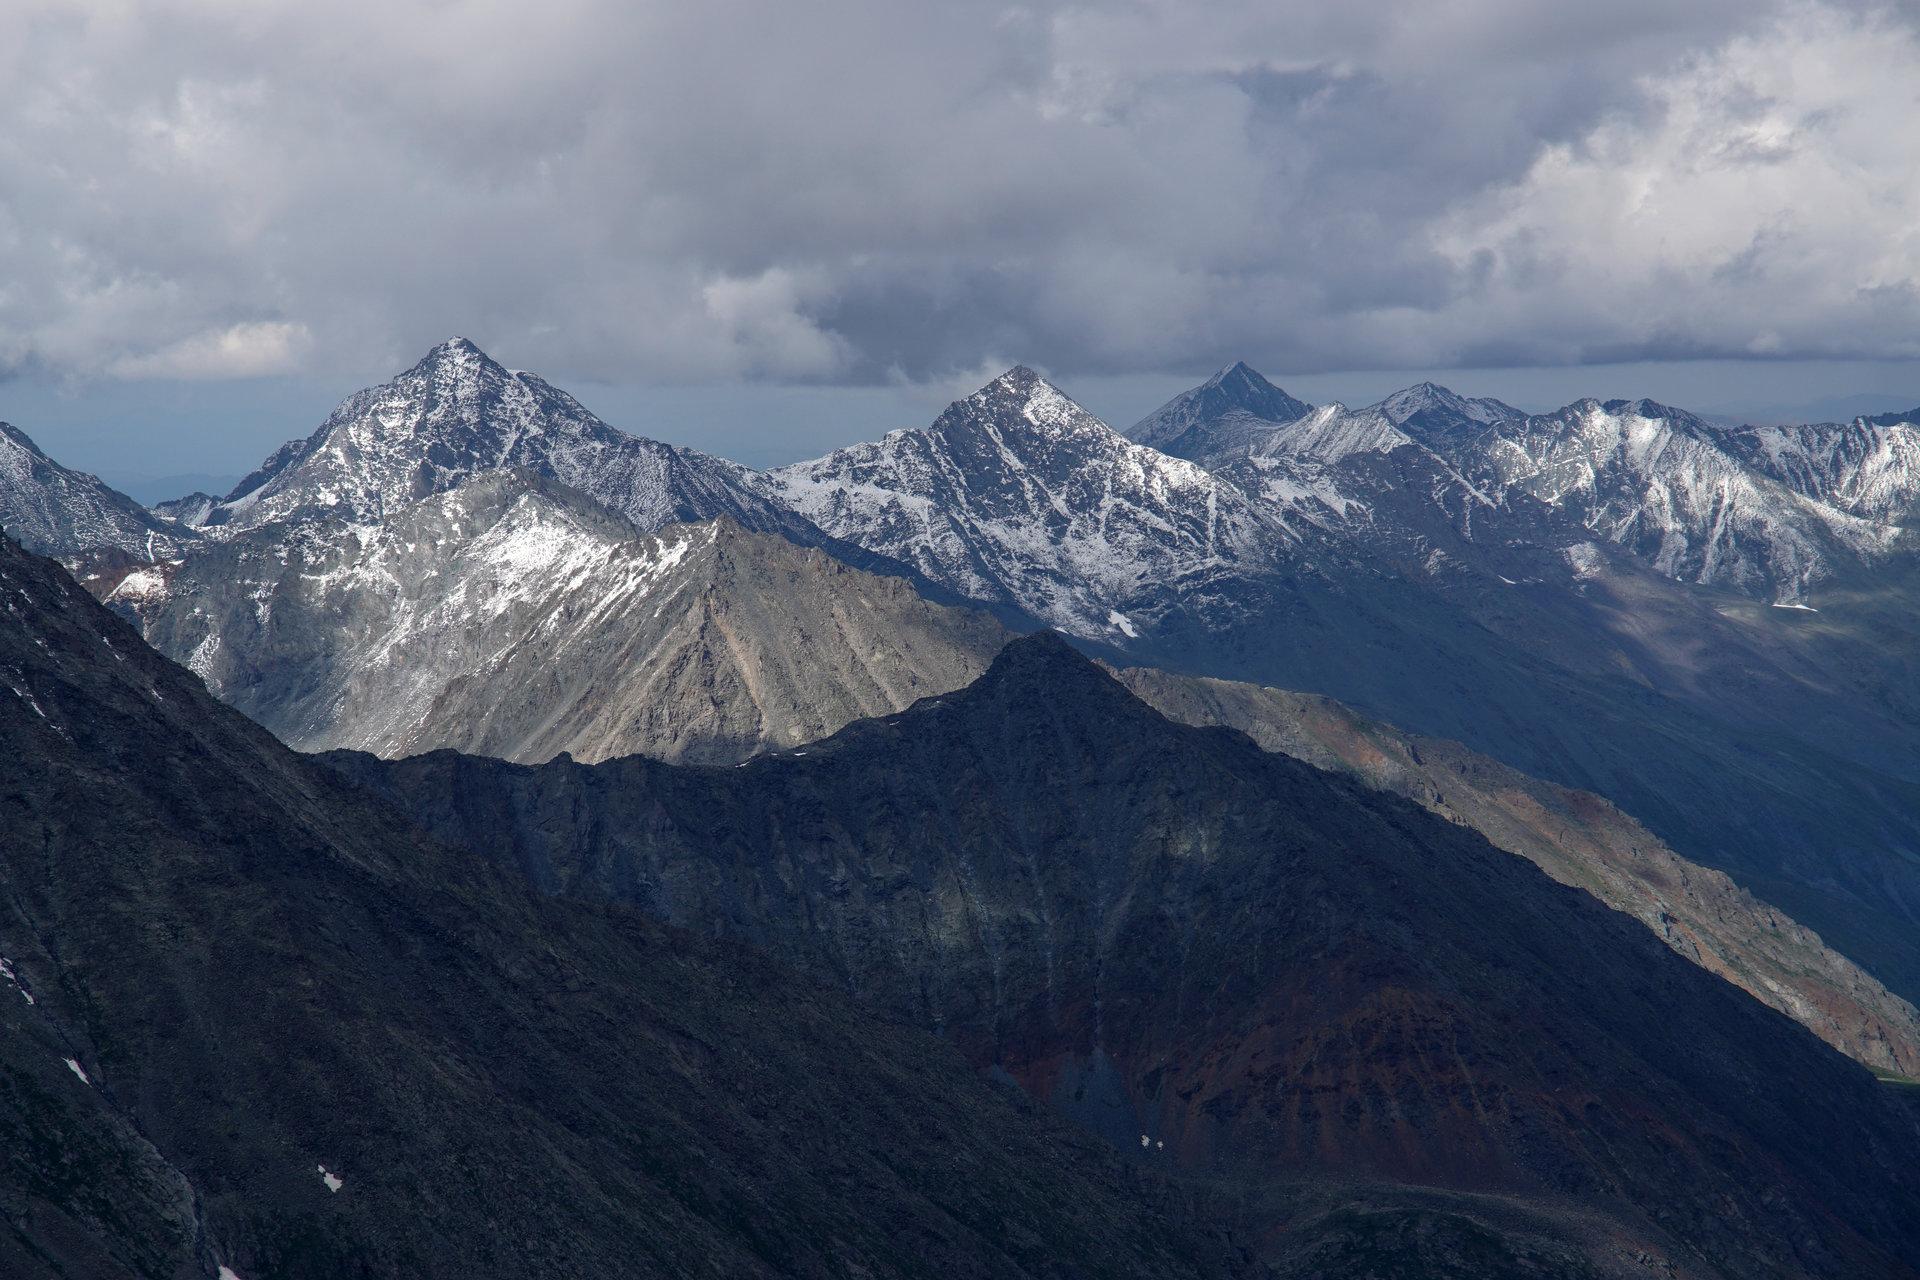 Планински простори ІІ от Ясен Долчинков - iasen_vd